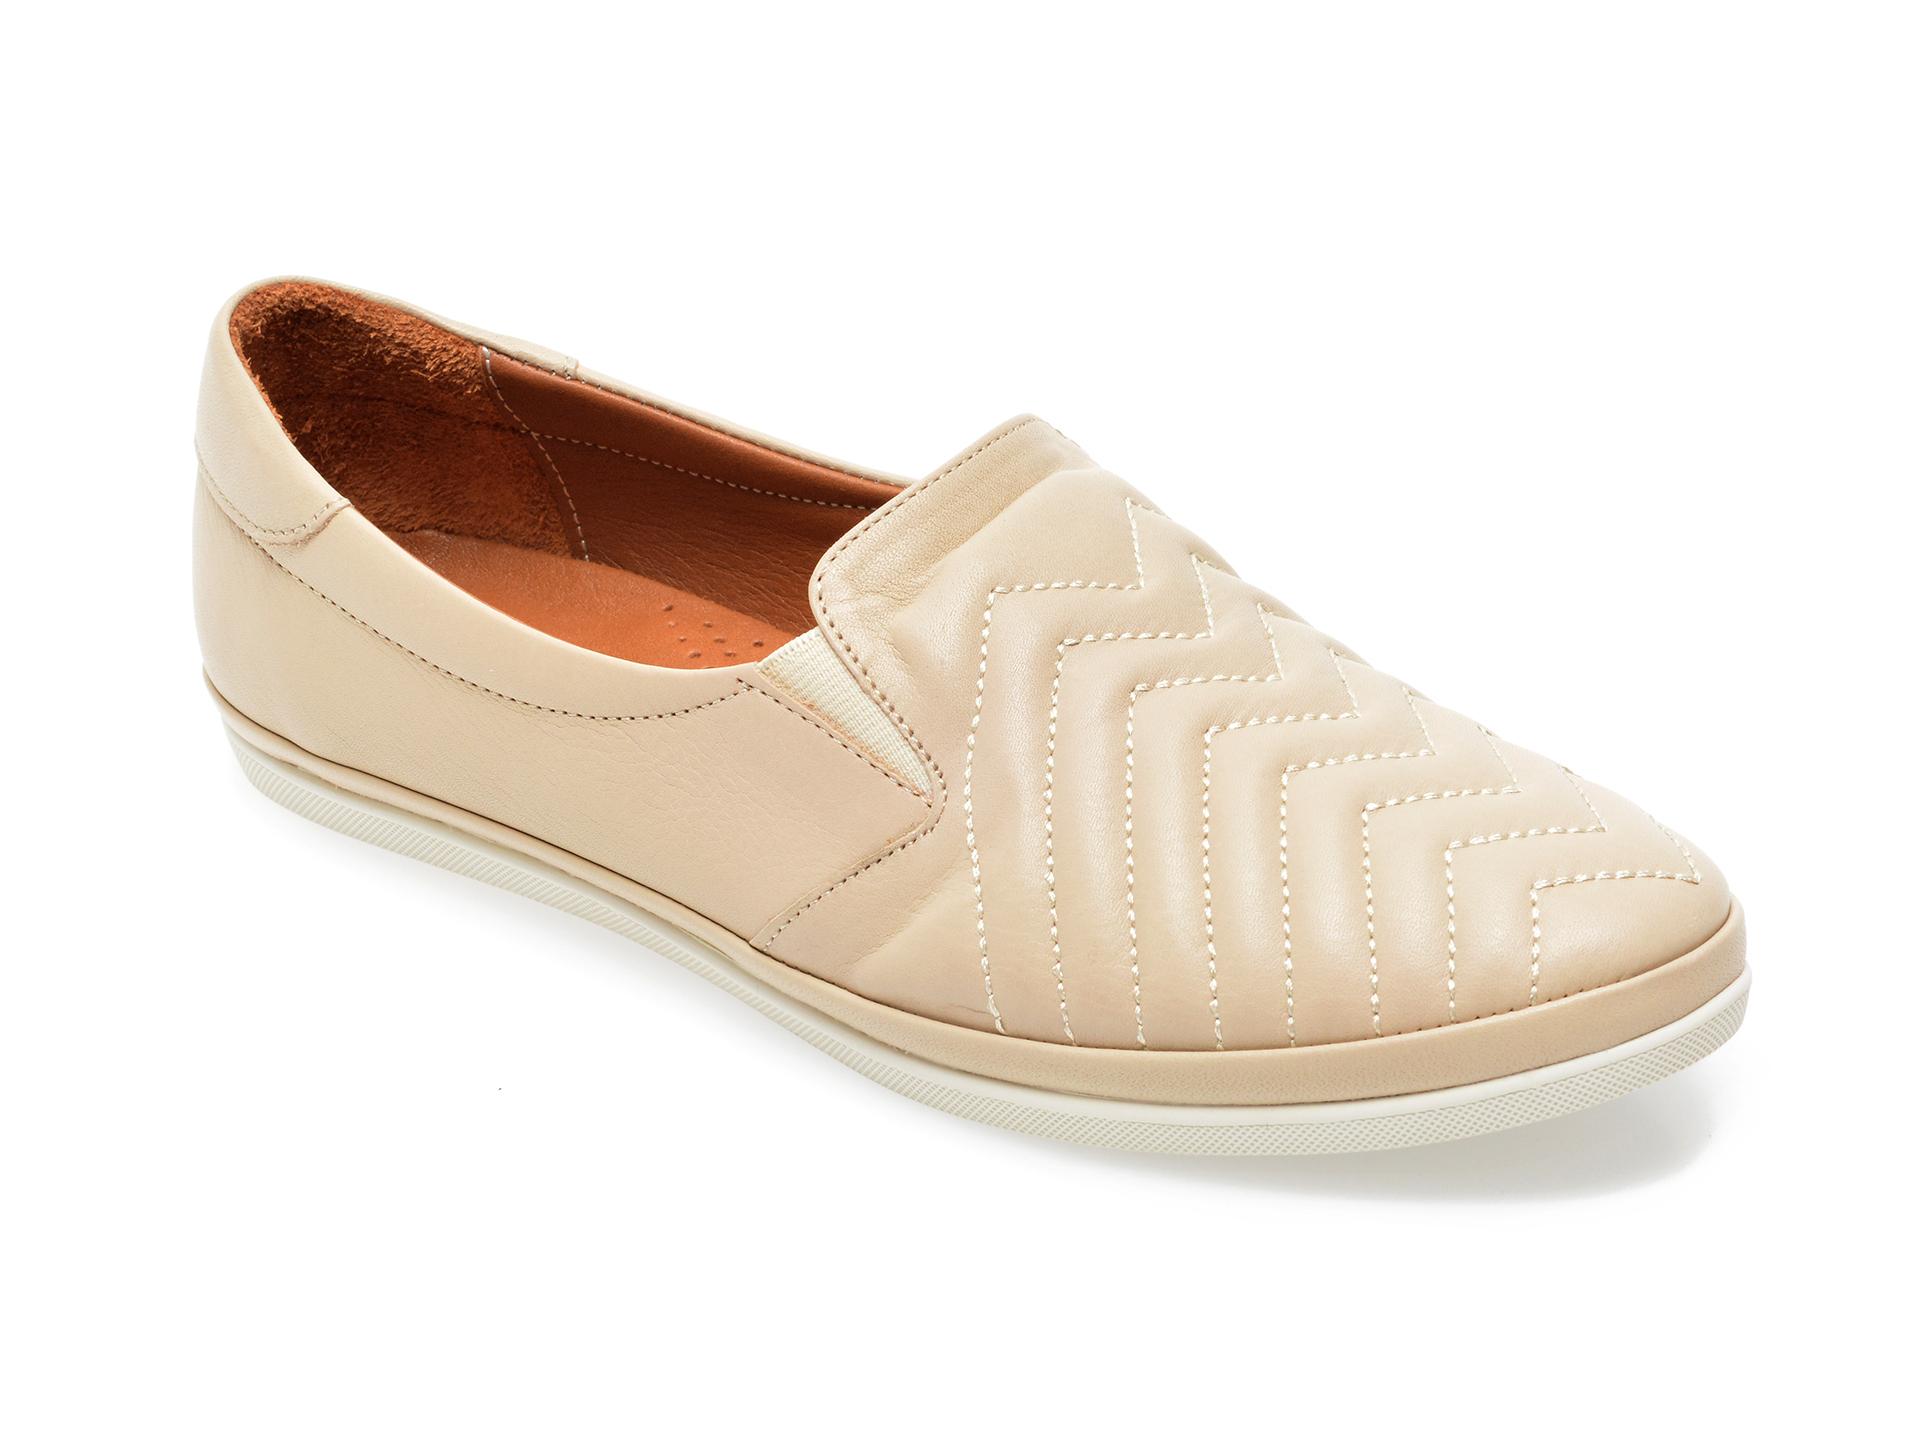 Pantofi IMAGE bej, 120G01, din piele naturala imagine otter.ro 2021